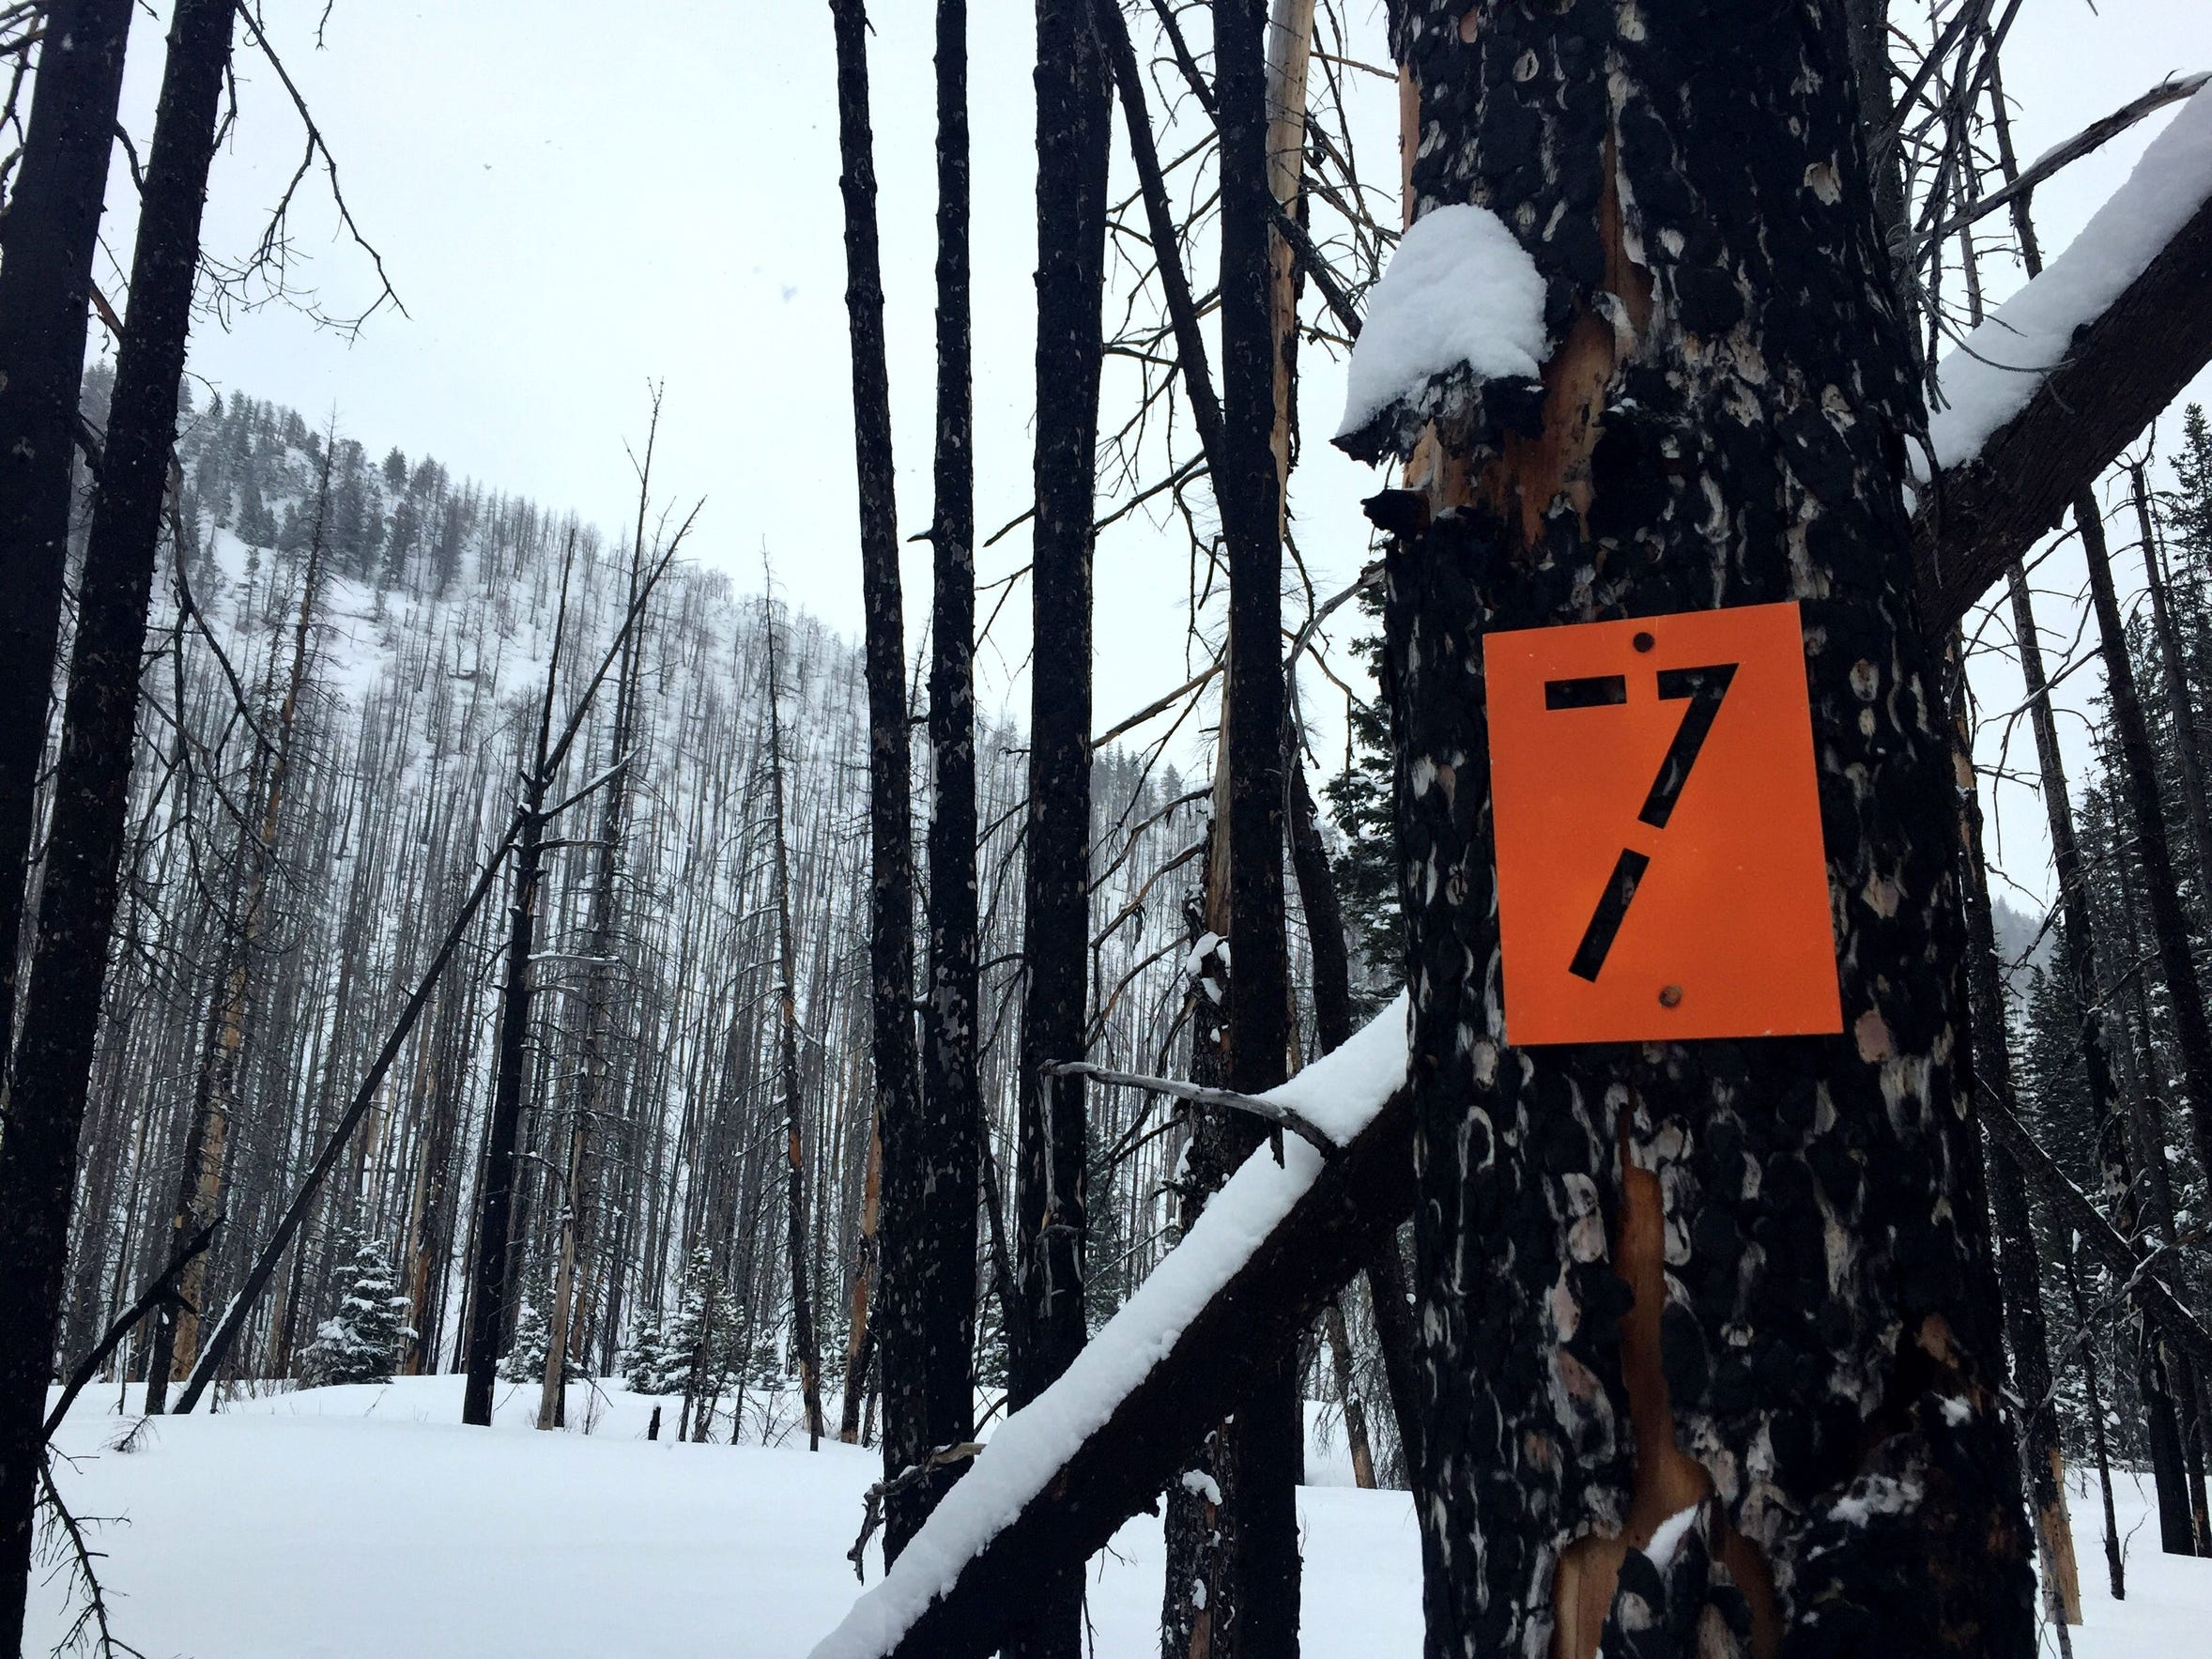 6 Snow survey 6